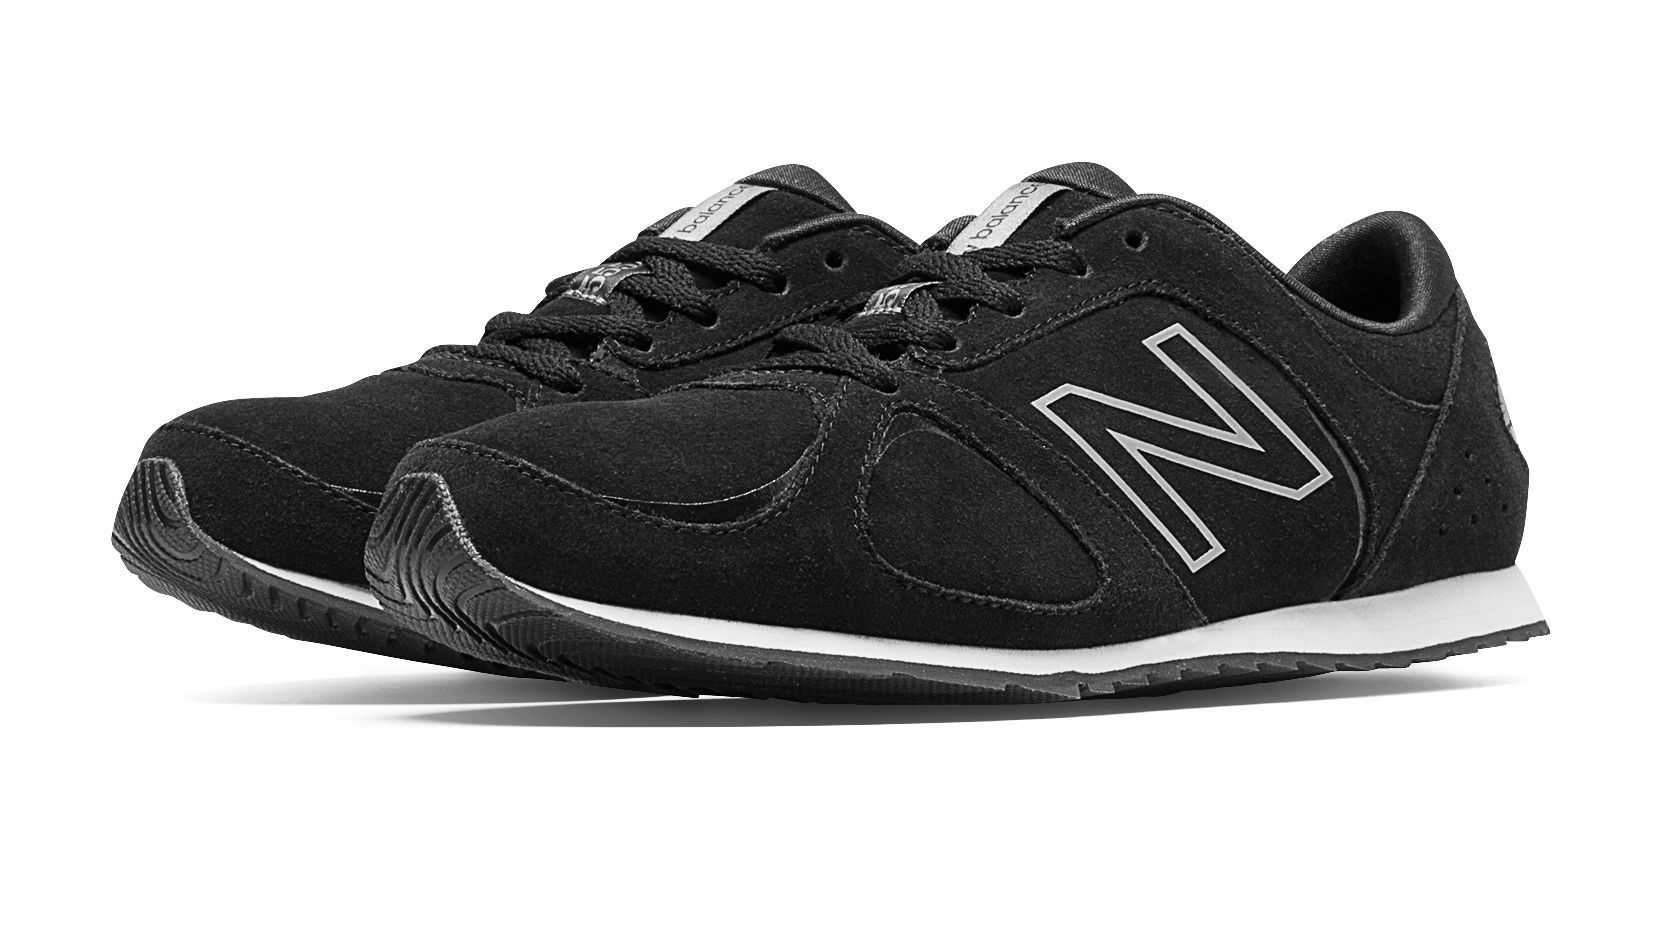 New Balance 555 New Balance, Black